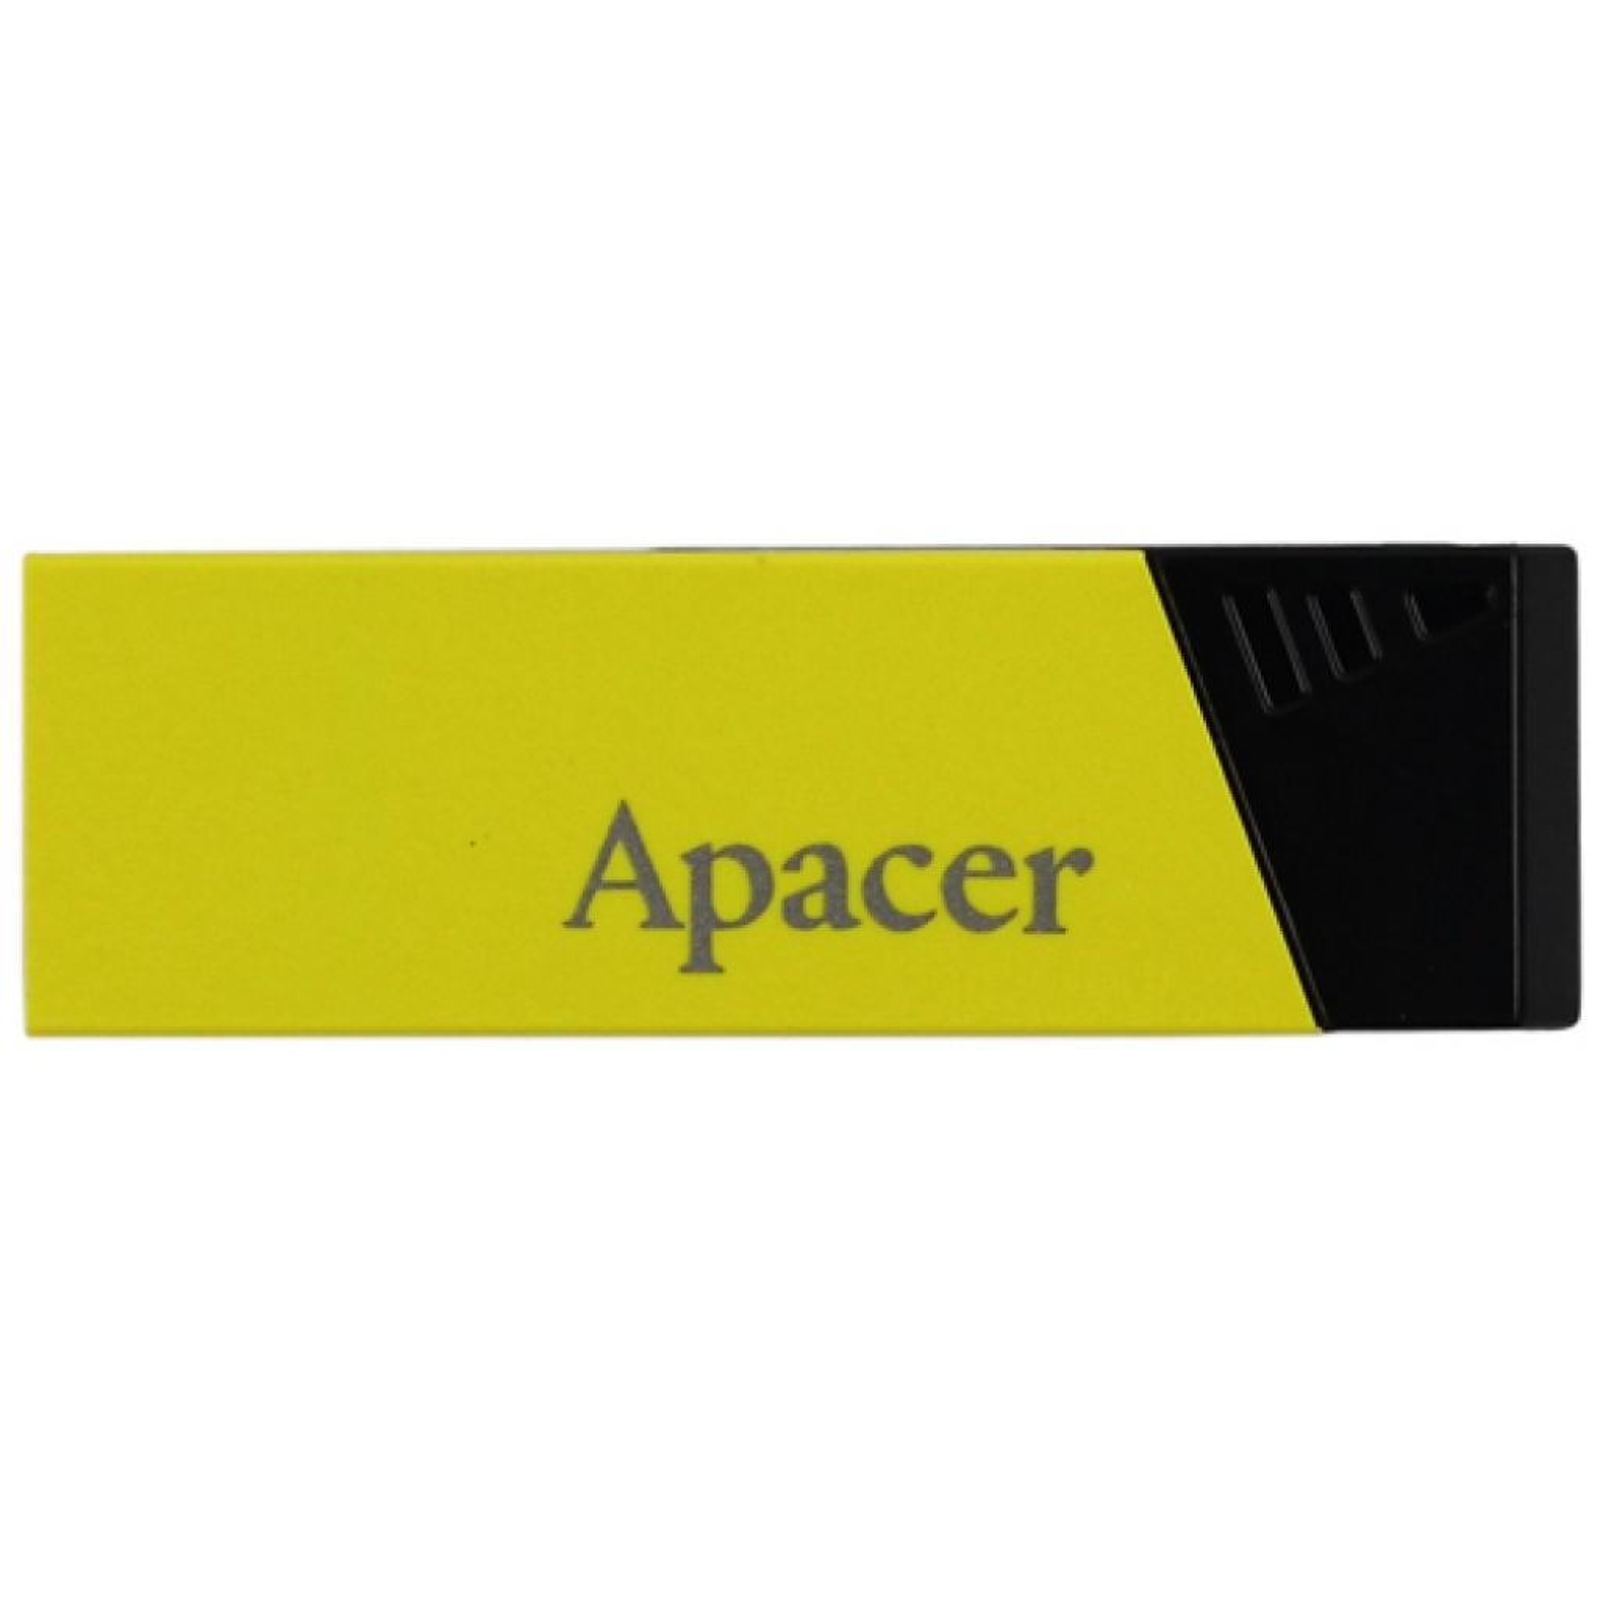 USB флеш накопитель 16GB AH131 Yellow RP USB2.0 Apacer (AP16GAH131Y-1)